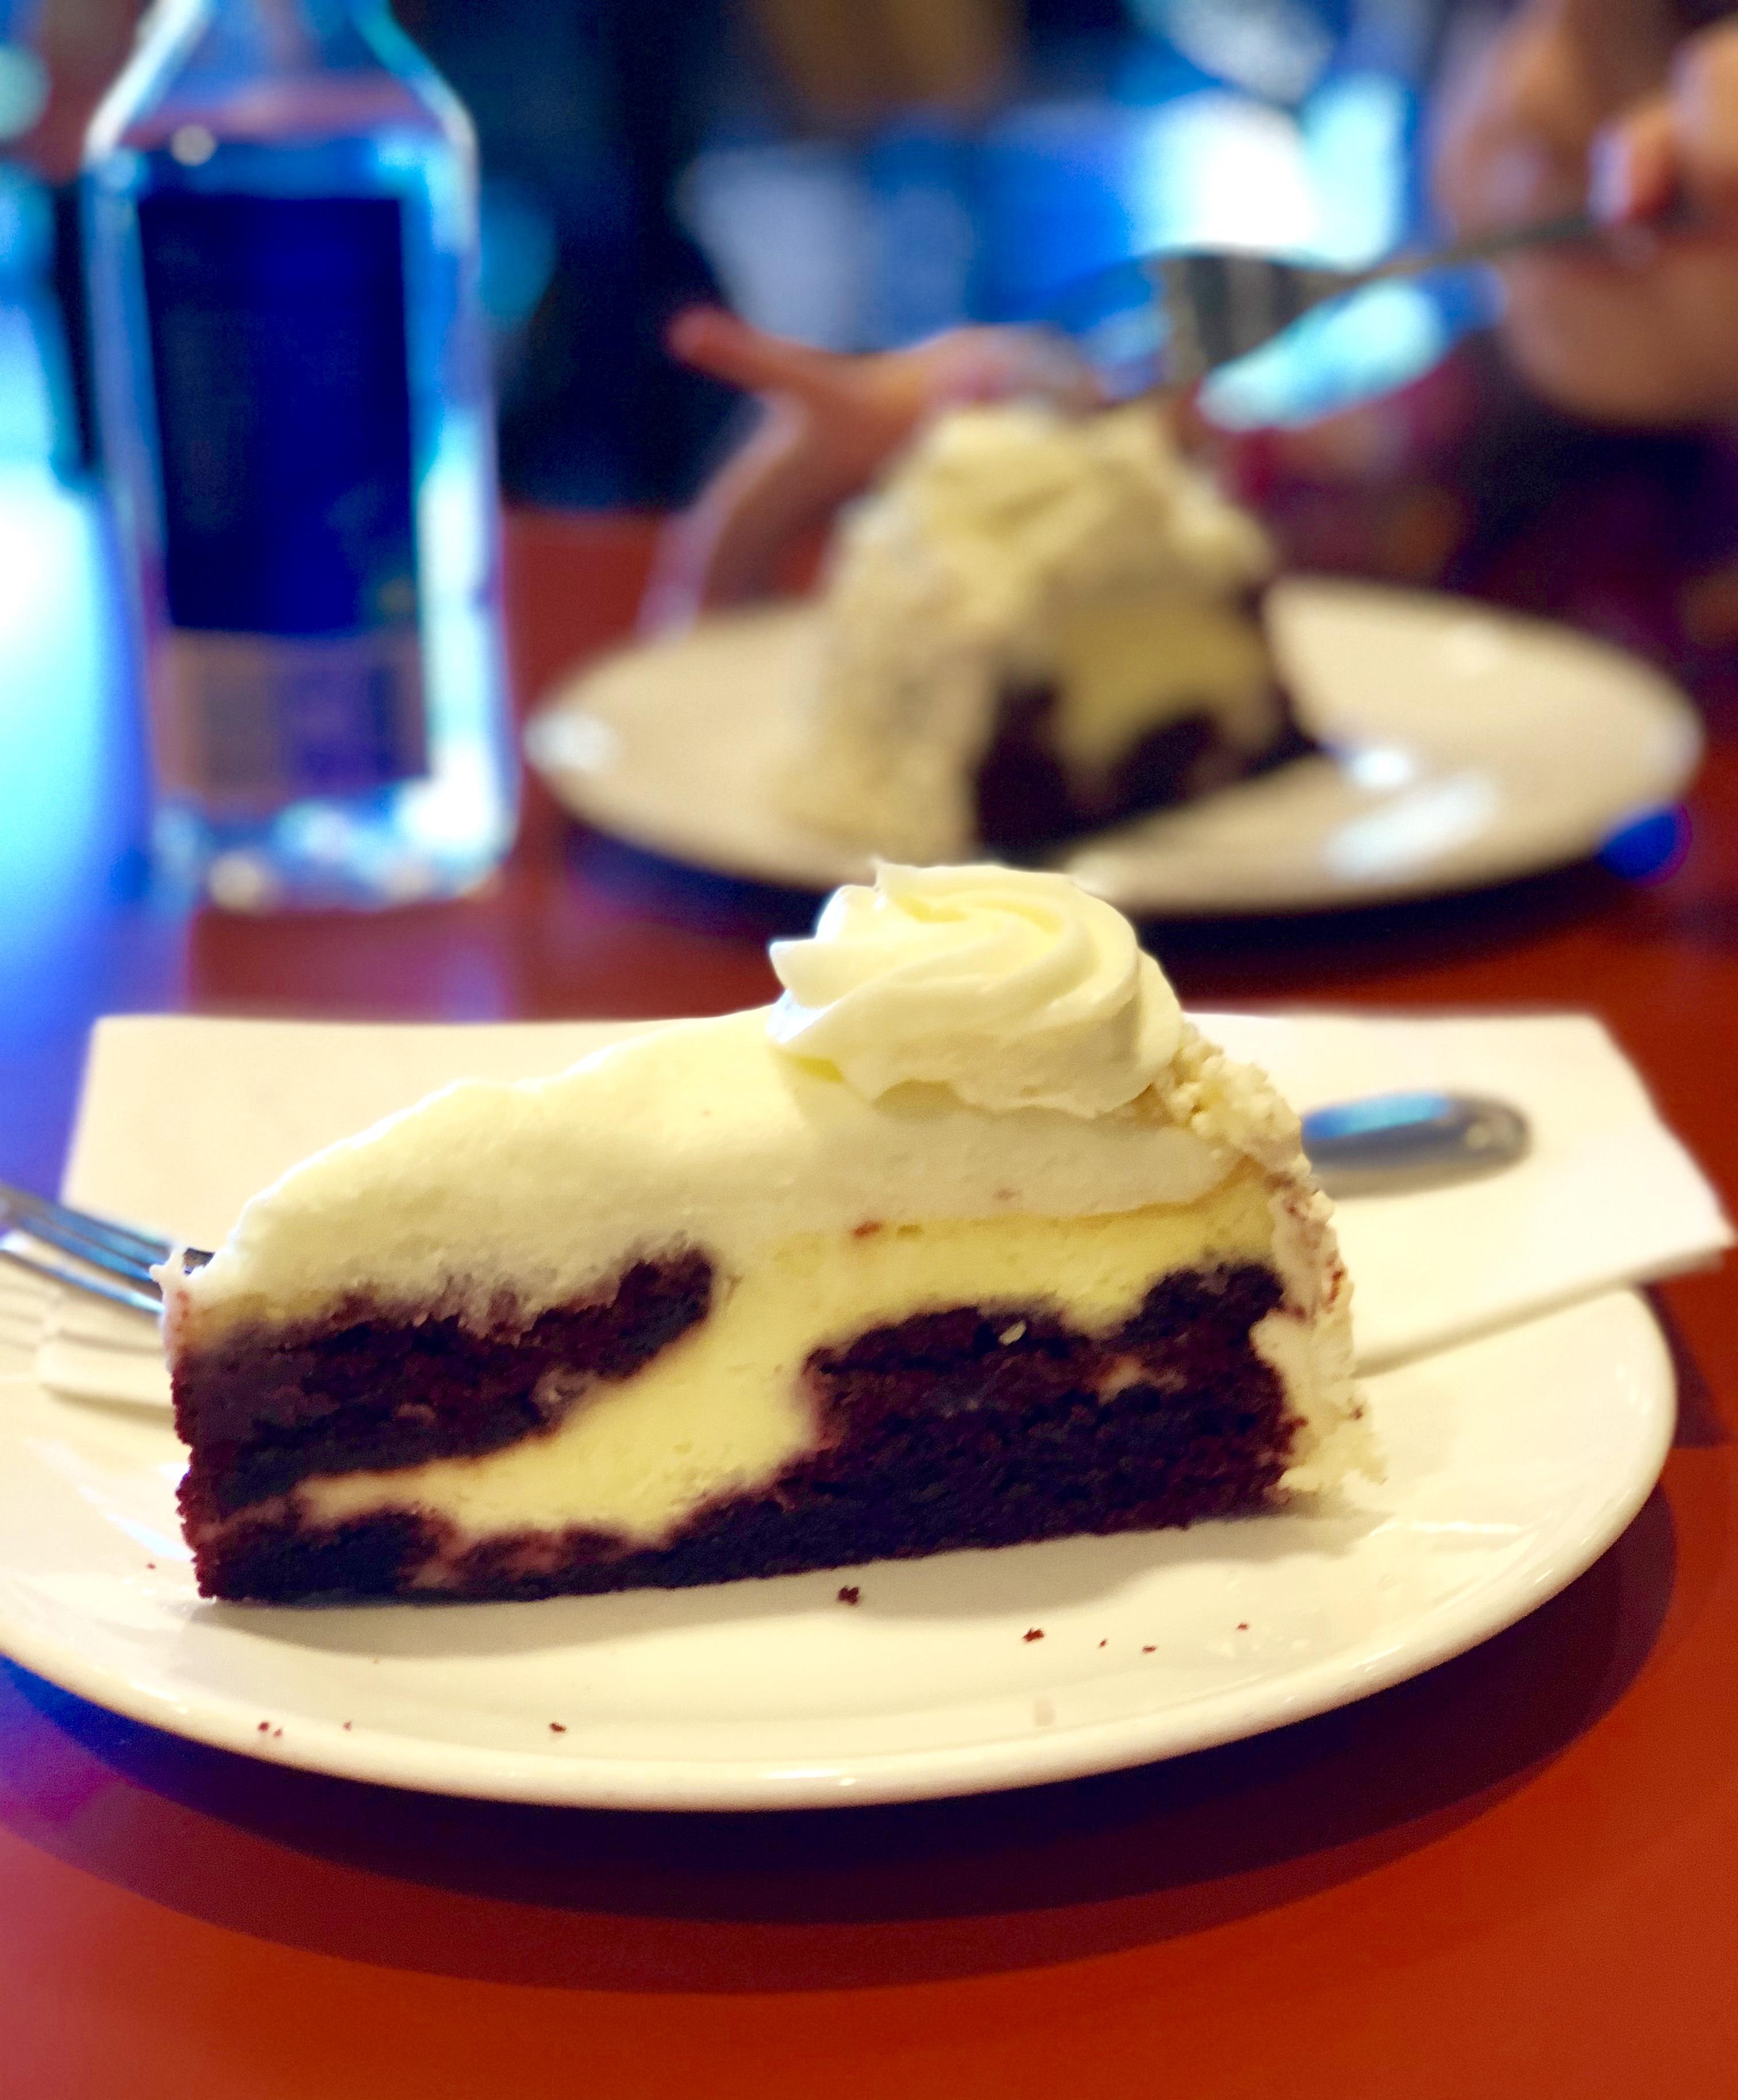 Dessert Date with Sophia